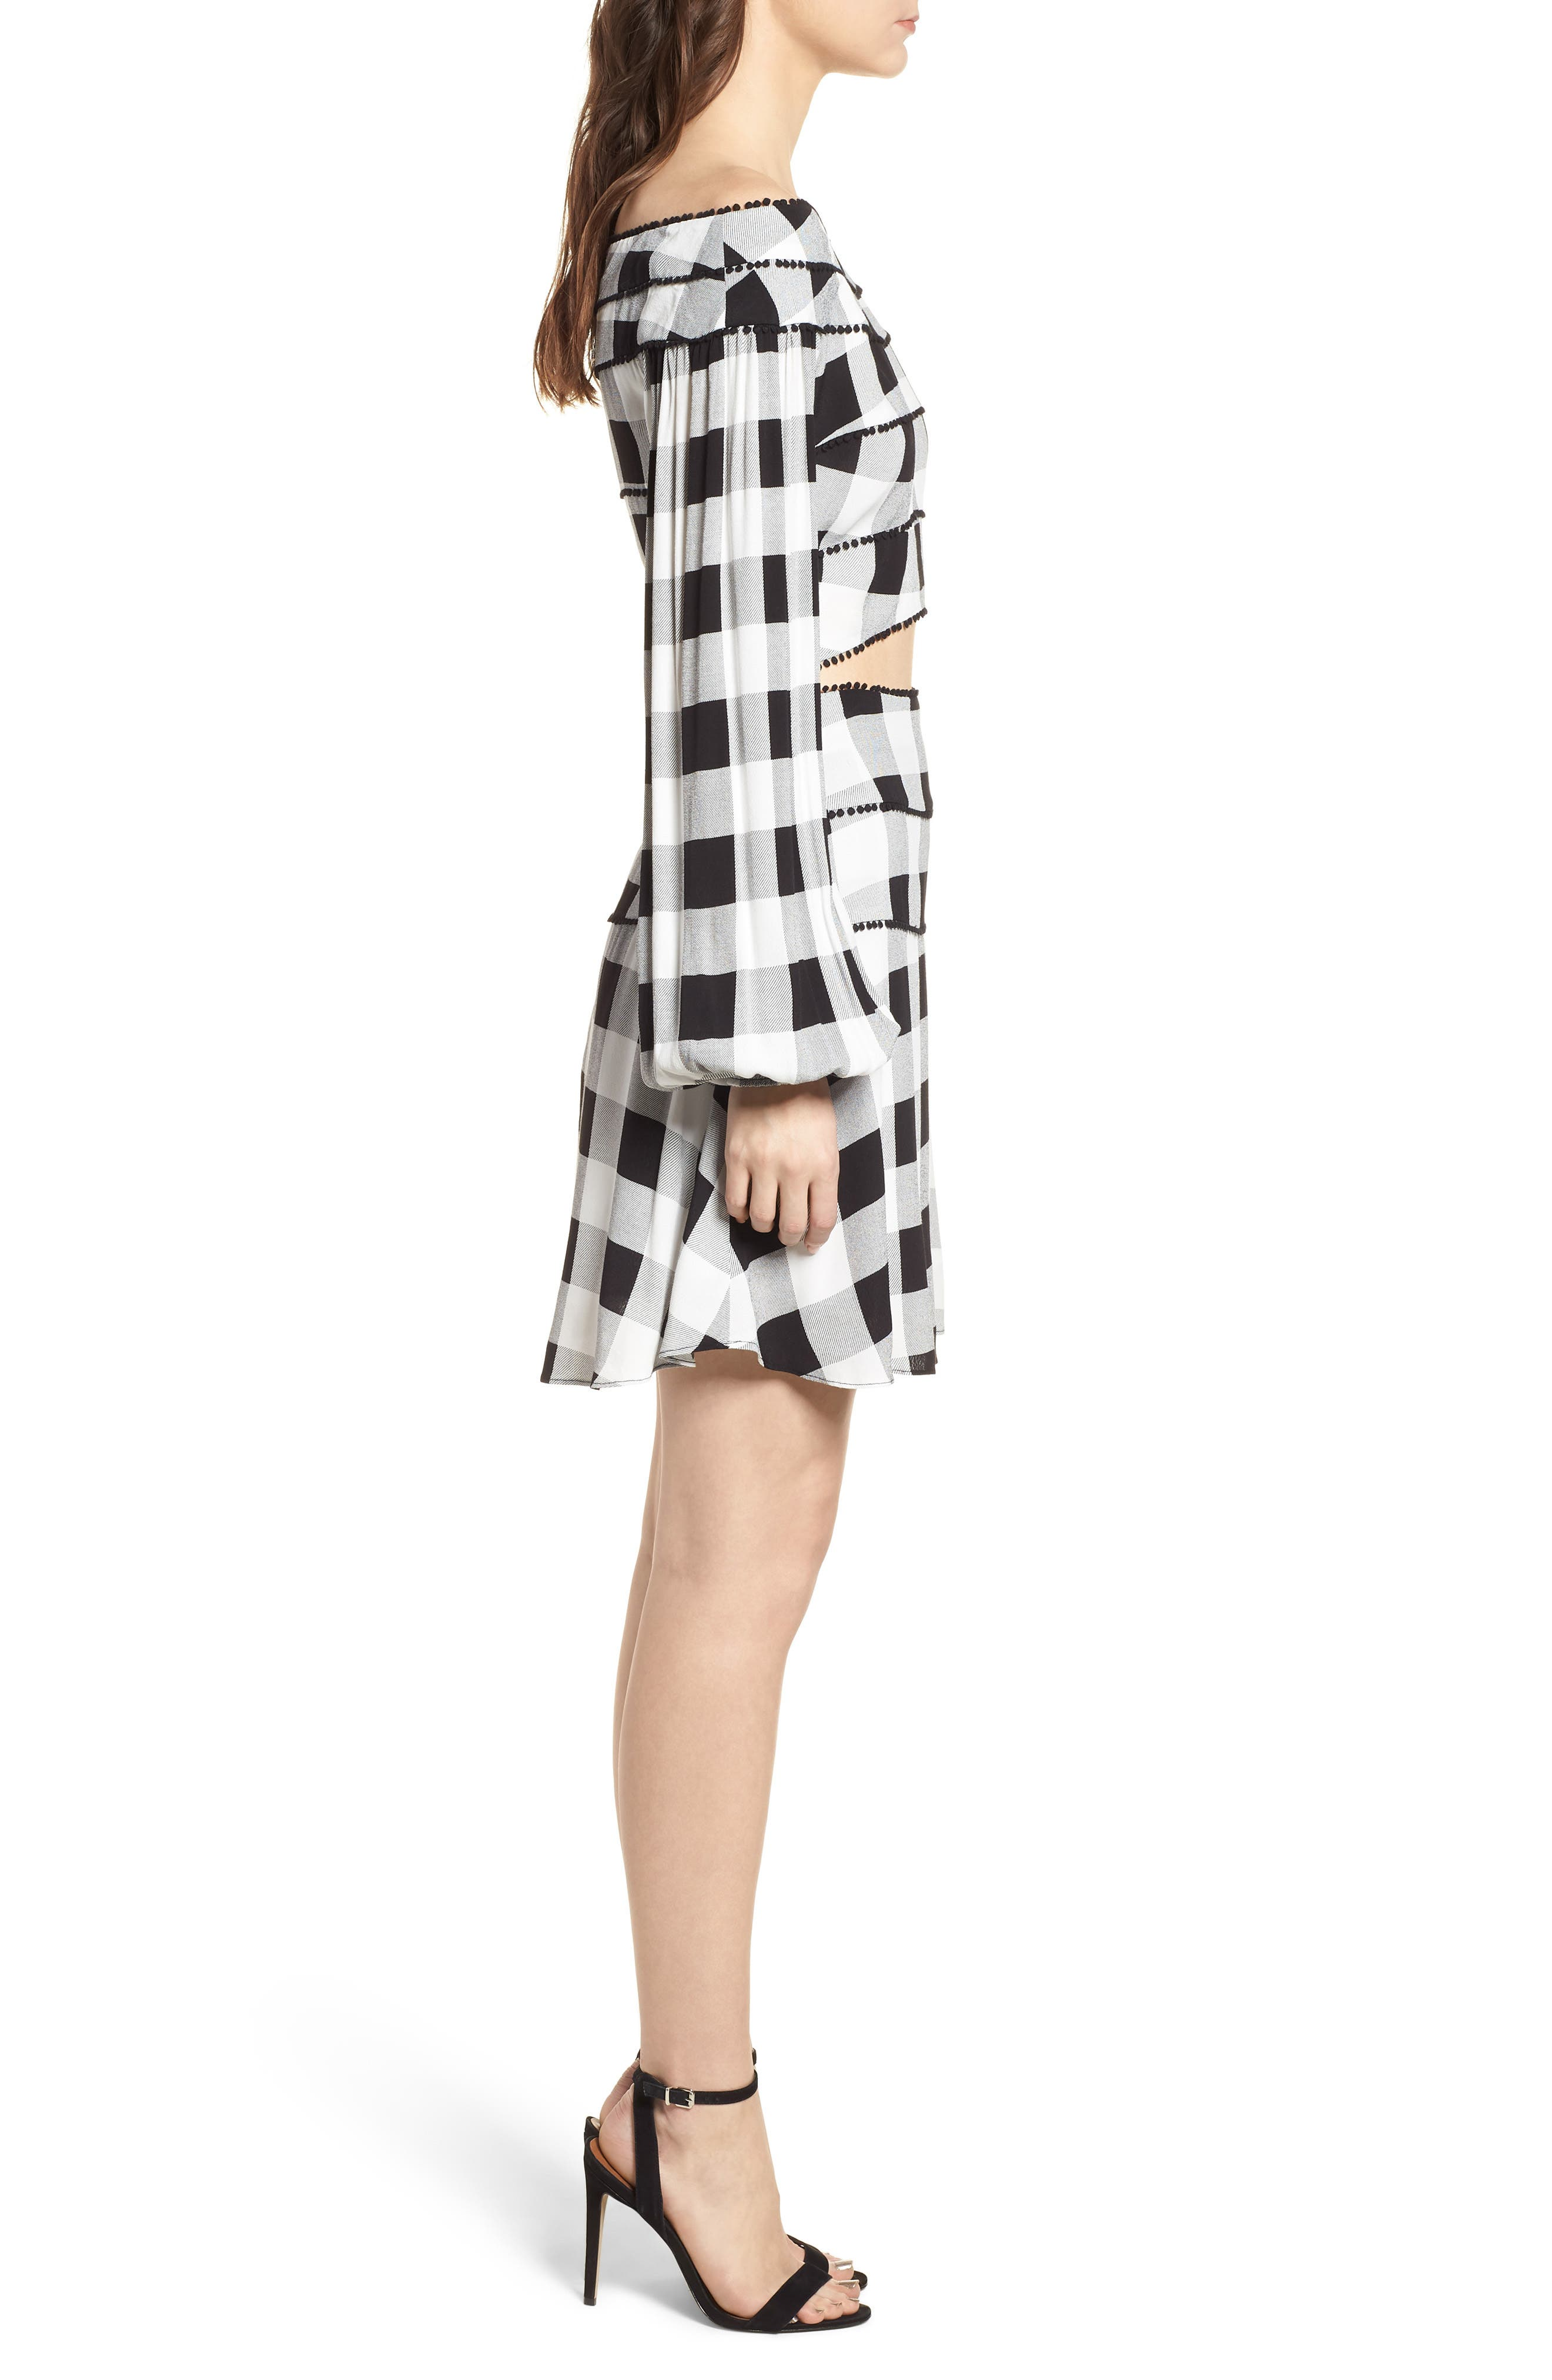 Bell High Waist Miniskirt,                             Alternate thumbnail 9, color,                             002